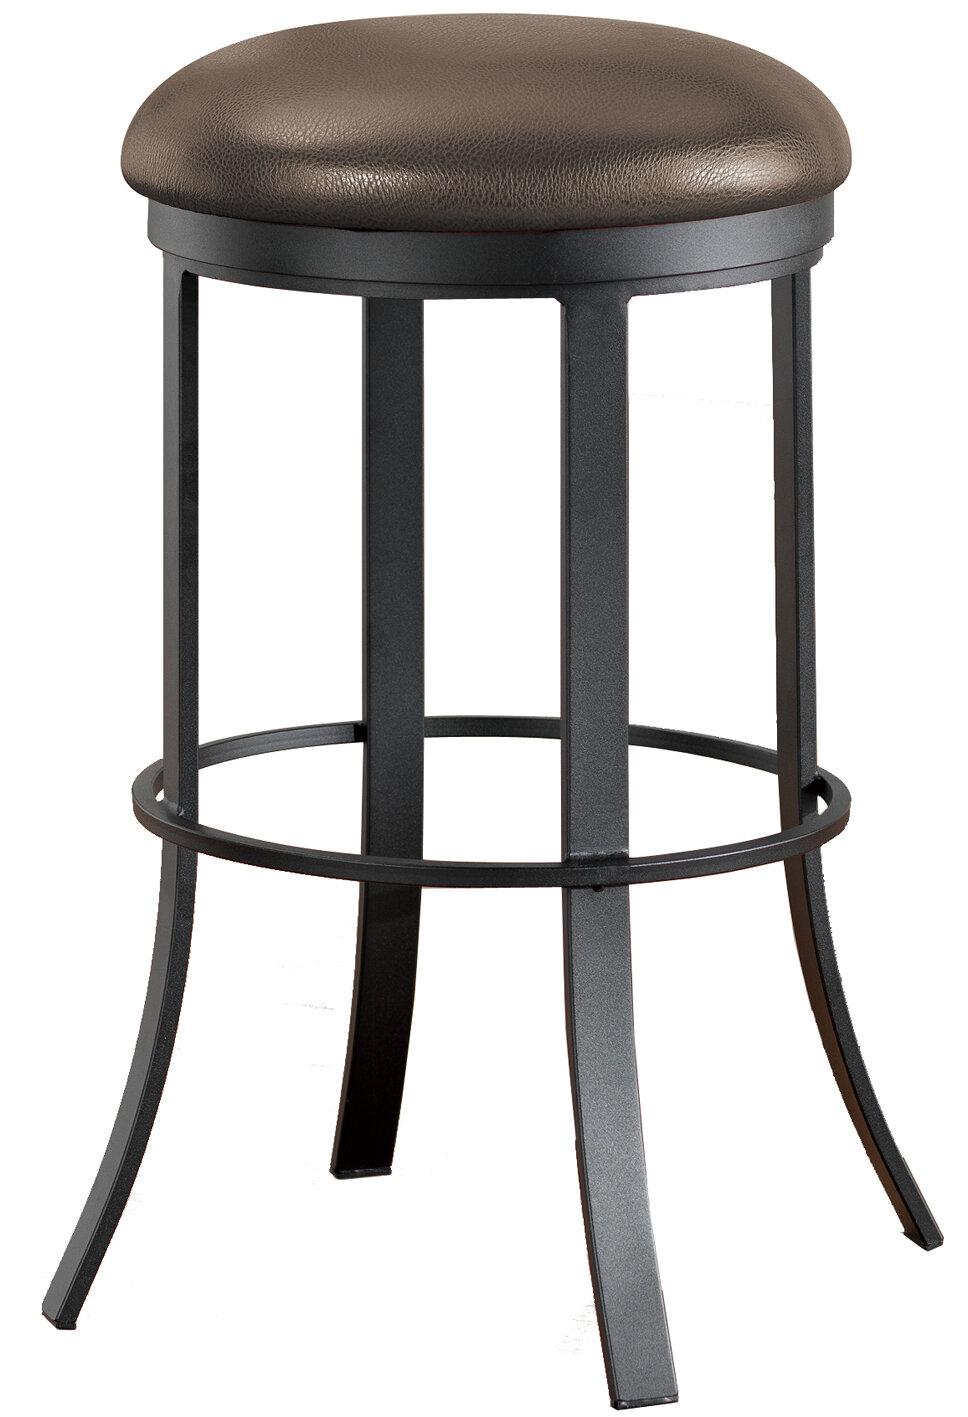 Wondrous Patricia 34 Swivel Bar Stool Cjindustries Chair Design For Home Cjindustriesco